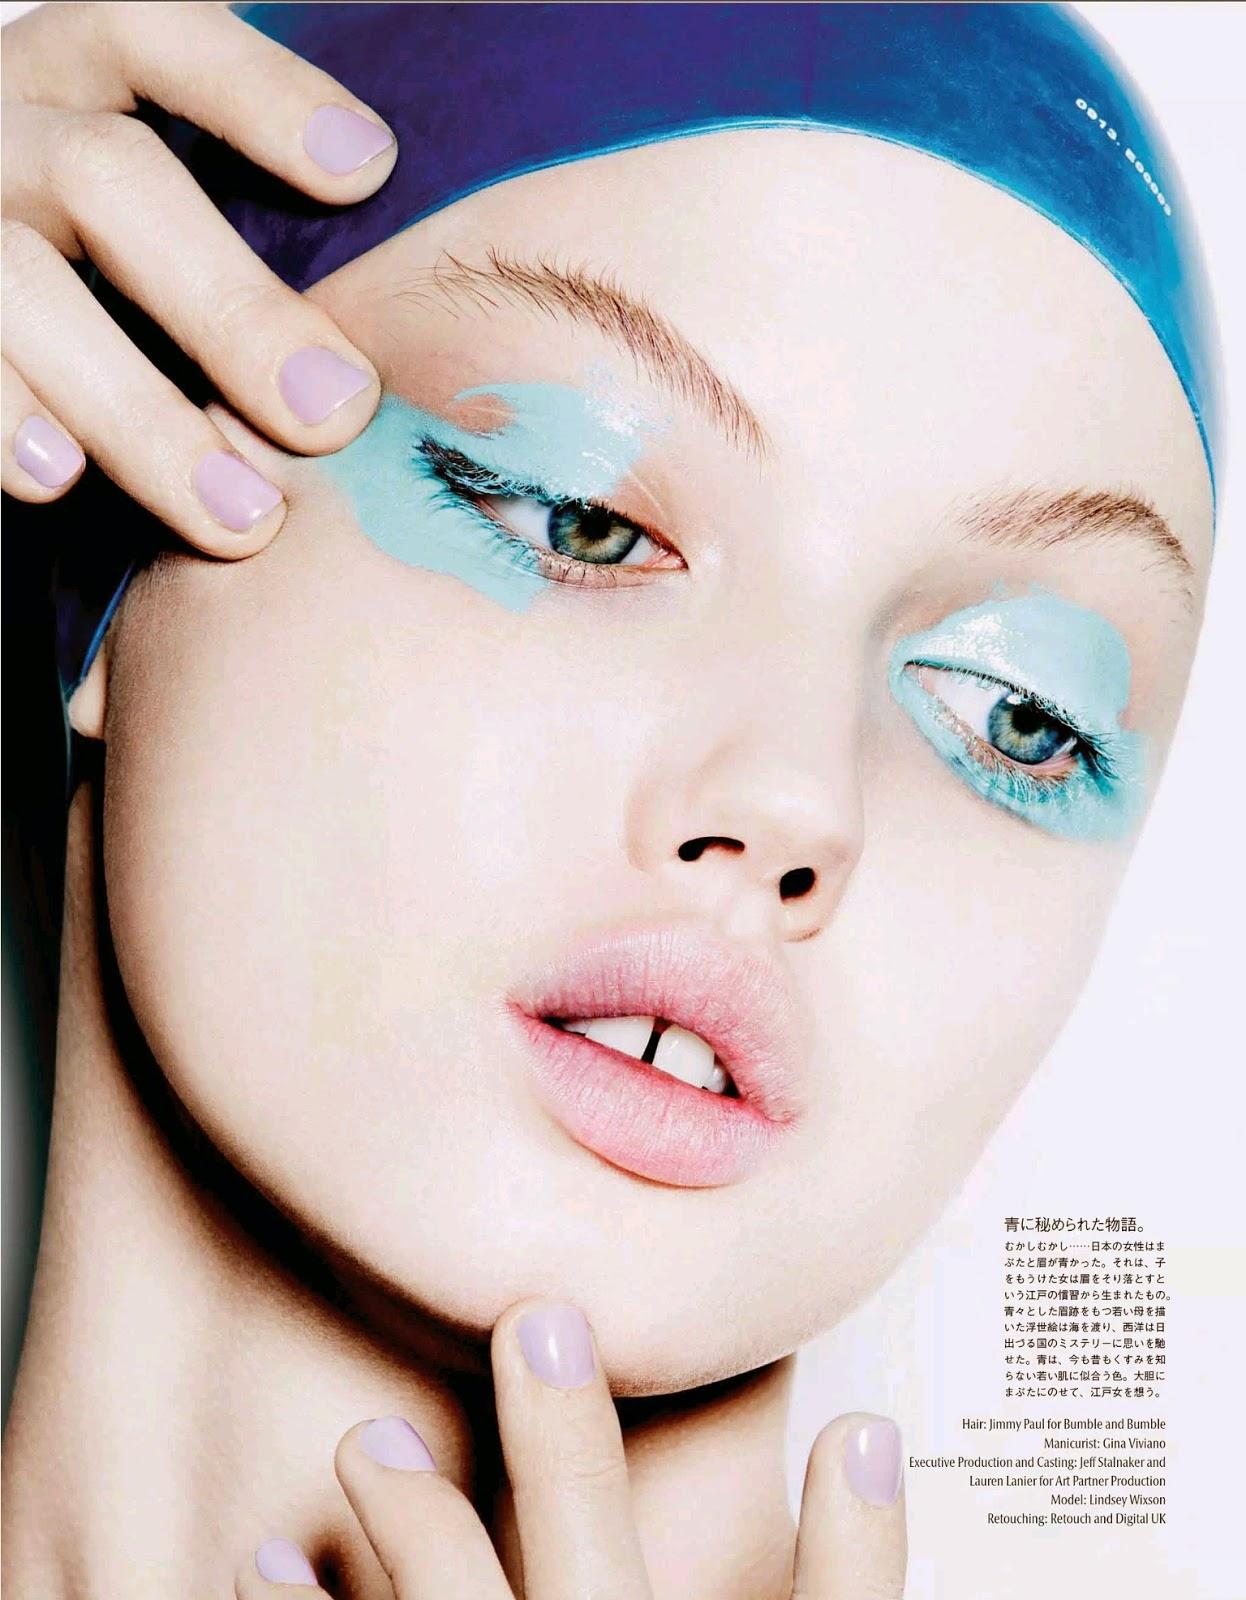 Линдси Виксон (Lindsey Wixson) в журнале Vogue Japan (3 фото)